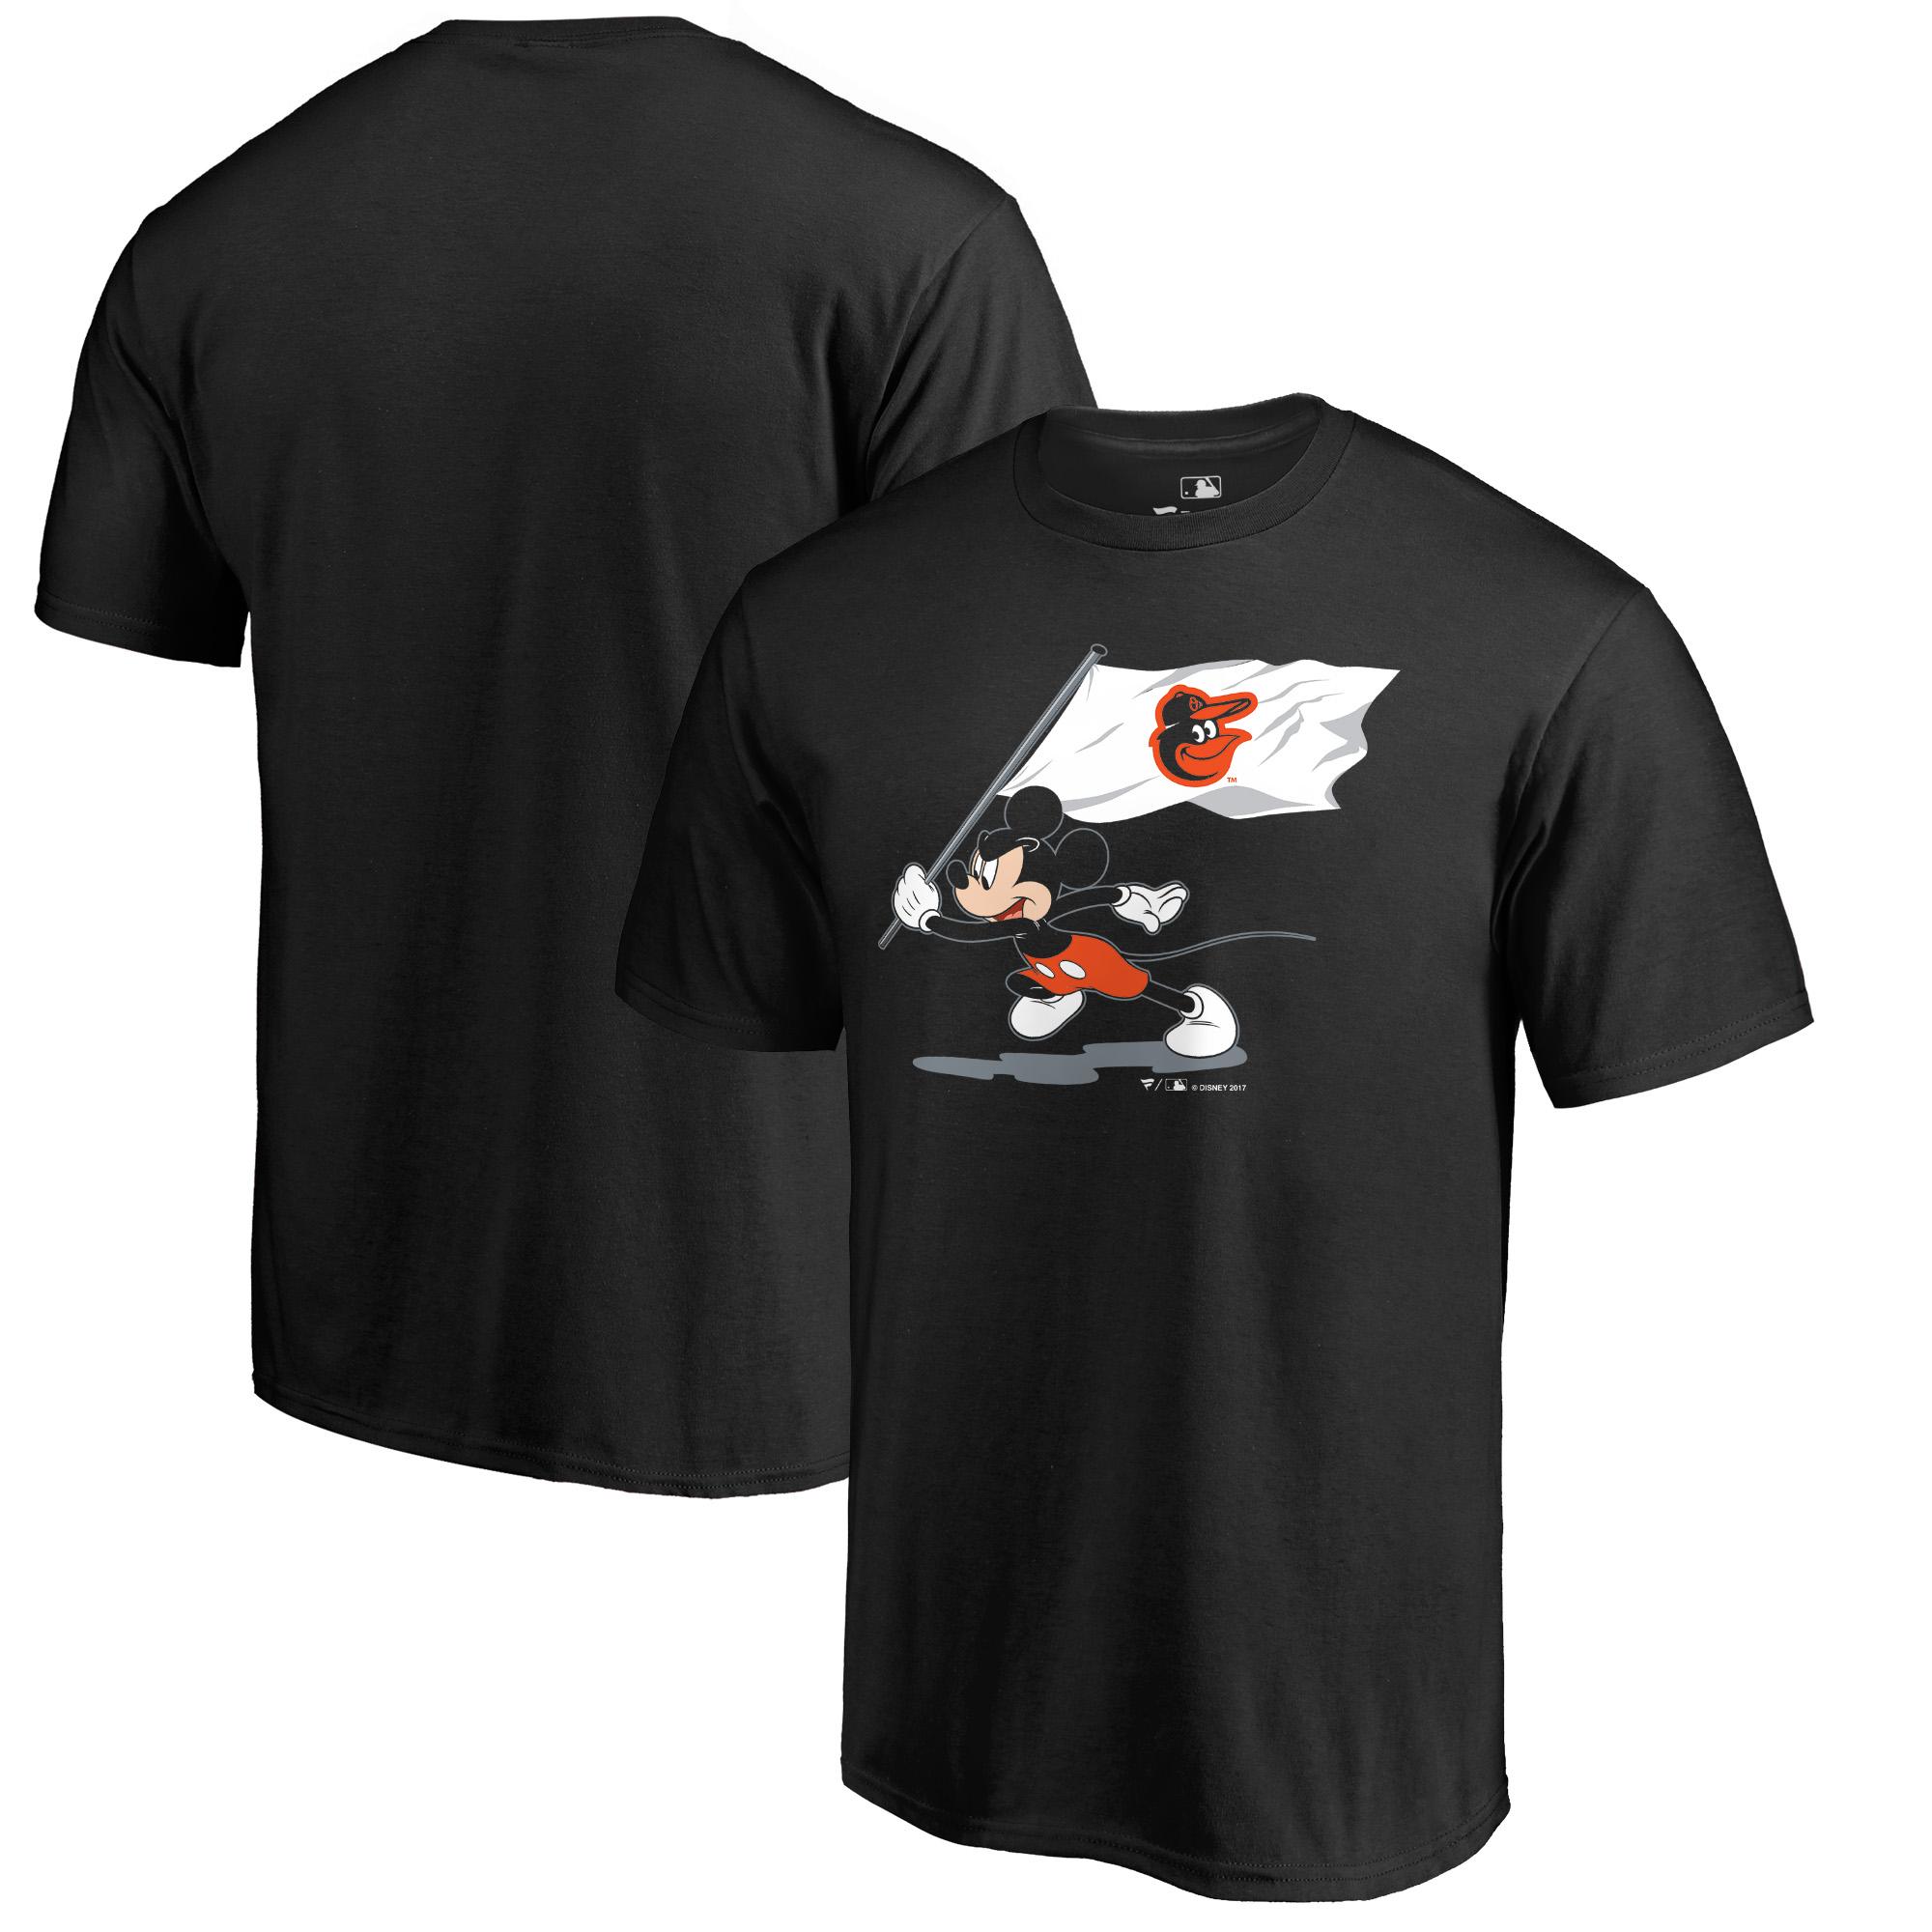 Baltimore Orioles Fanatics Branded Disney Fly Your Flag T-Shirt - Black